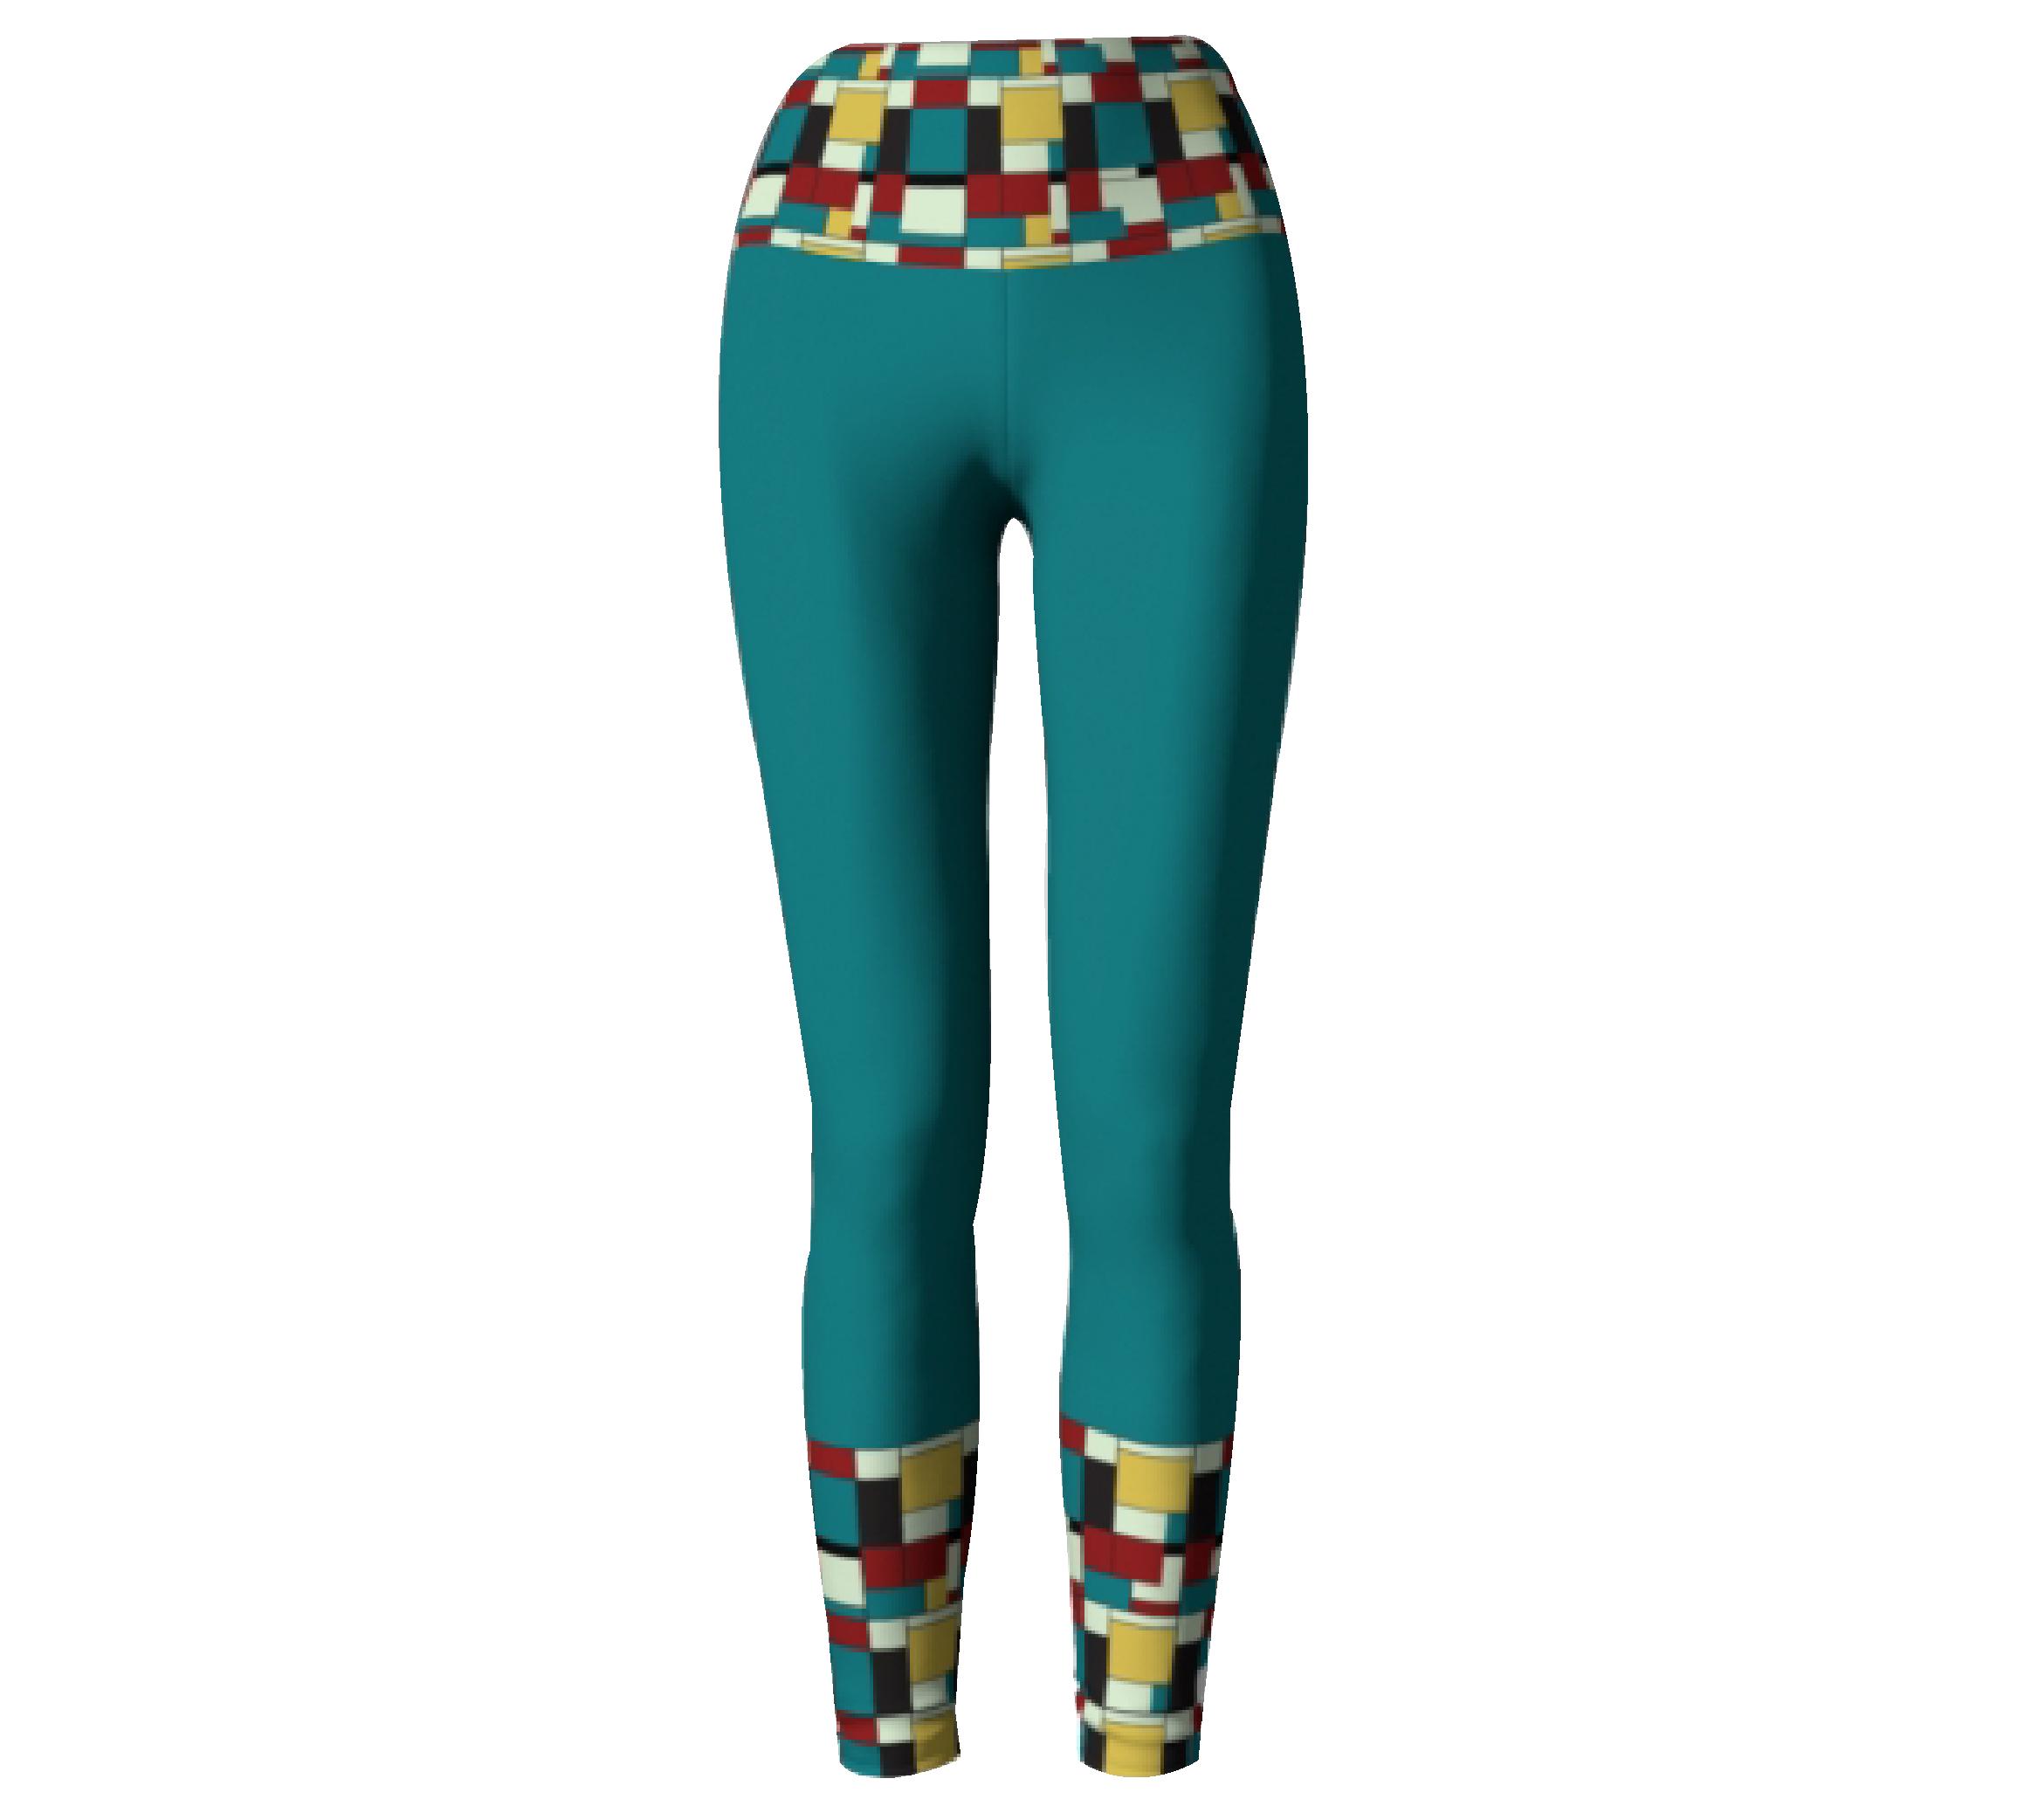 Turquoise Block Print       Leggings $45